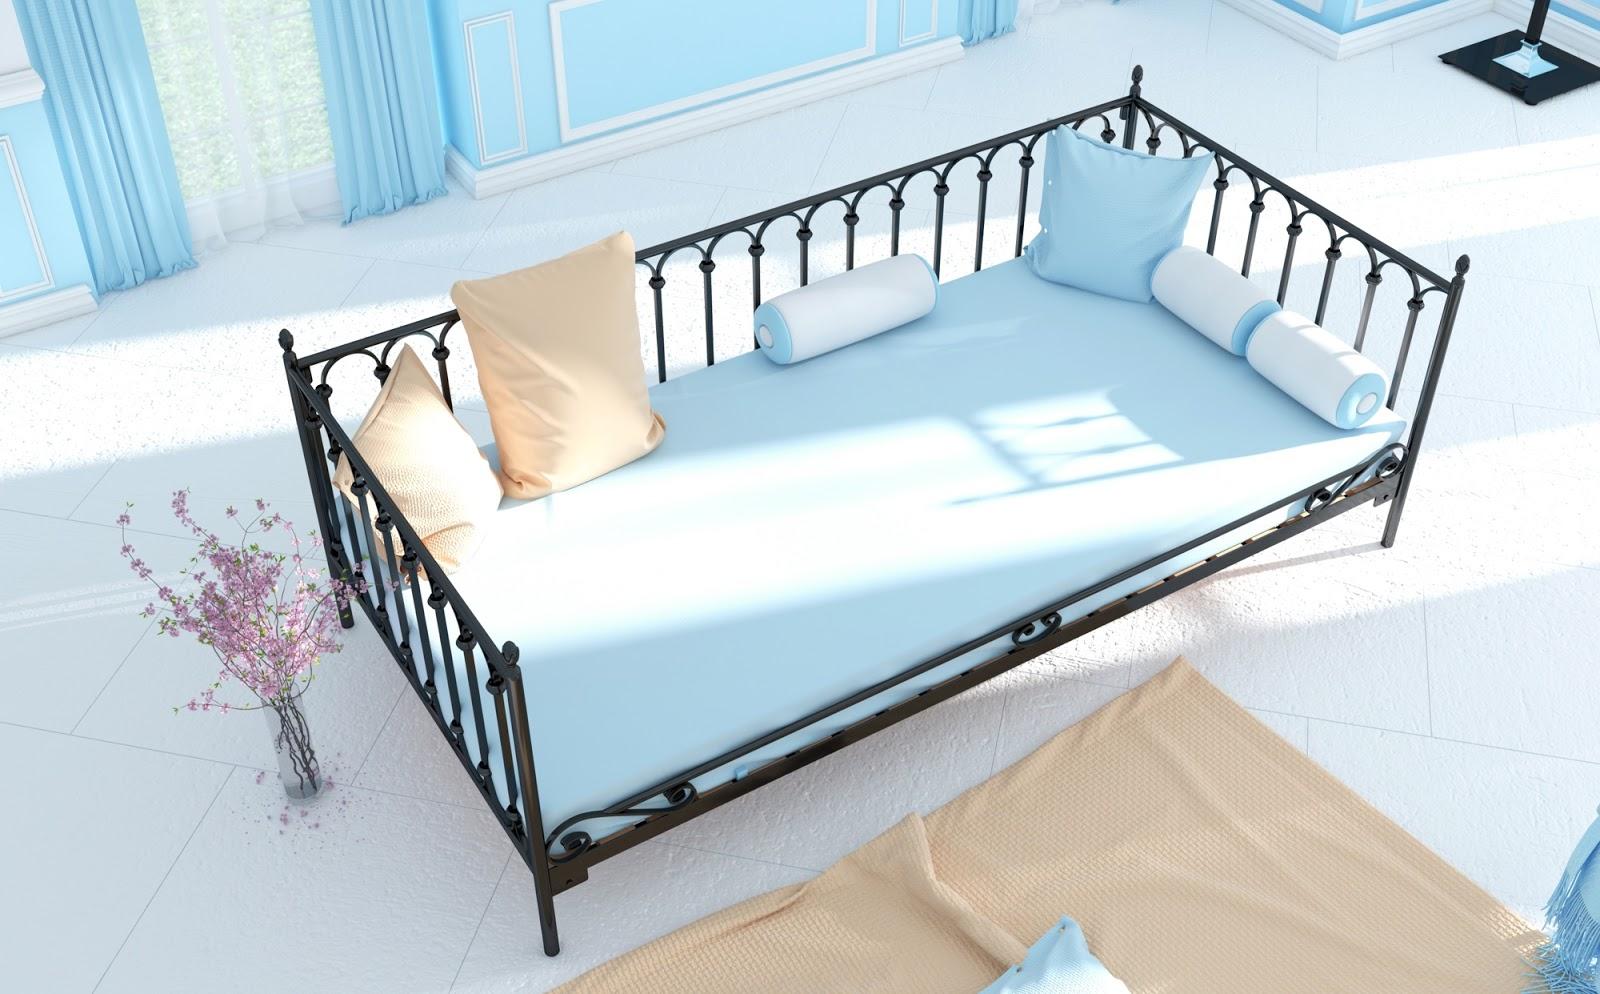 Łóżko metalowe sofa wzór 8S